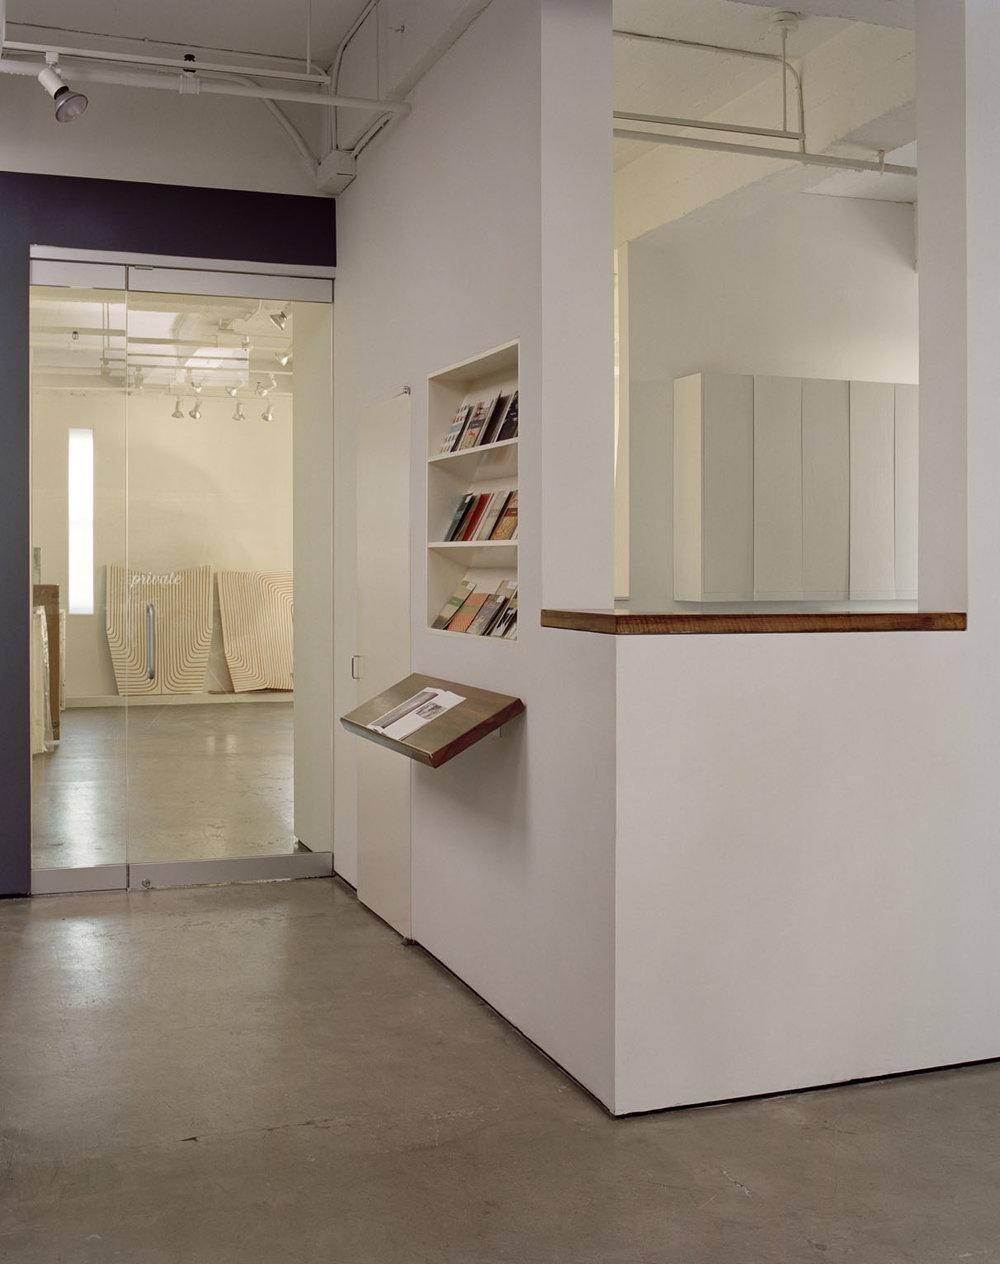 Sears Peyton Gallery,  2008